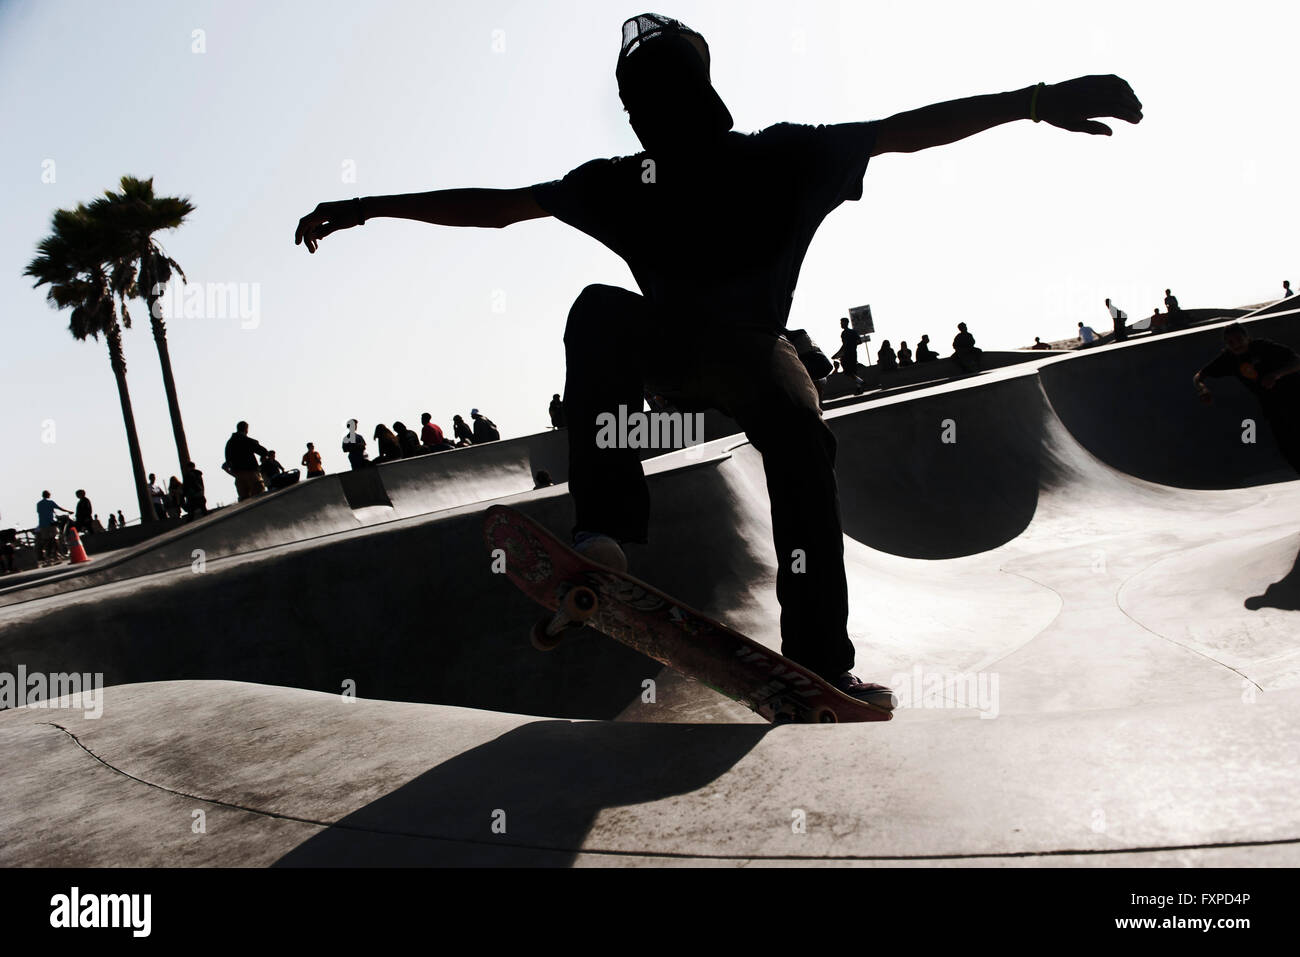 Young man skateboarding in skate park Stock Photo